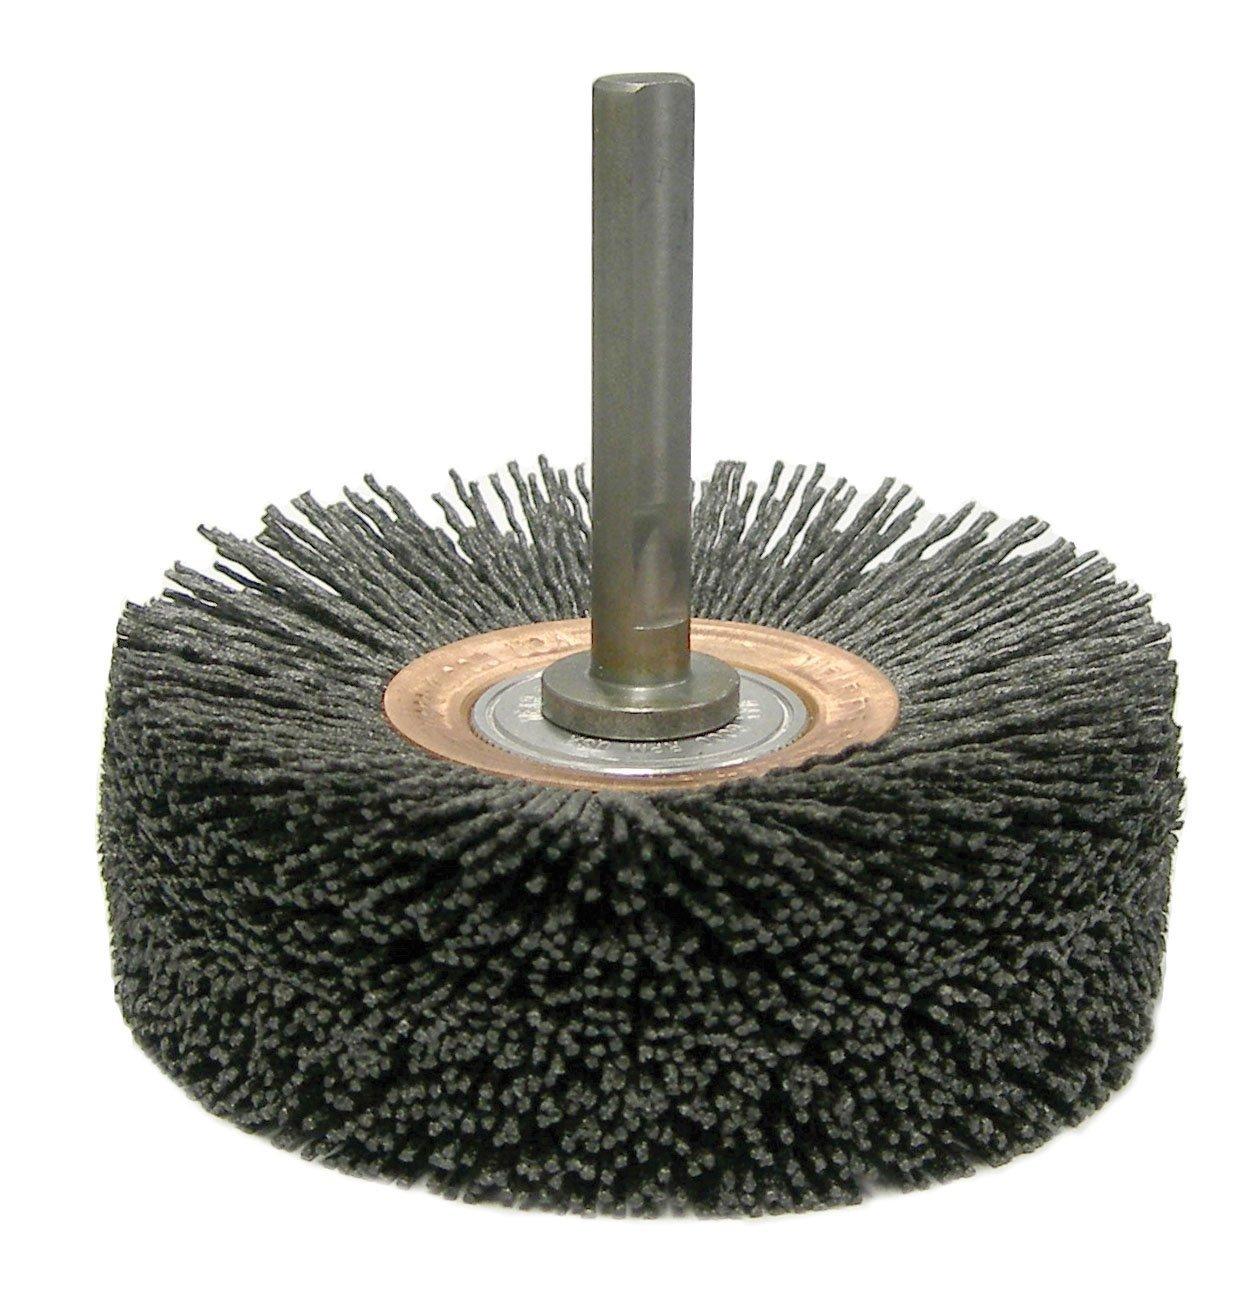 Brass Gordon Brush 91044 Single Spiral Brush with Ring Handle 5//8in Brush Diameter